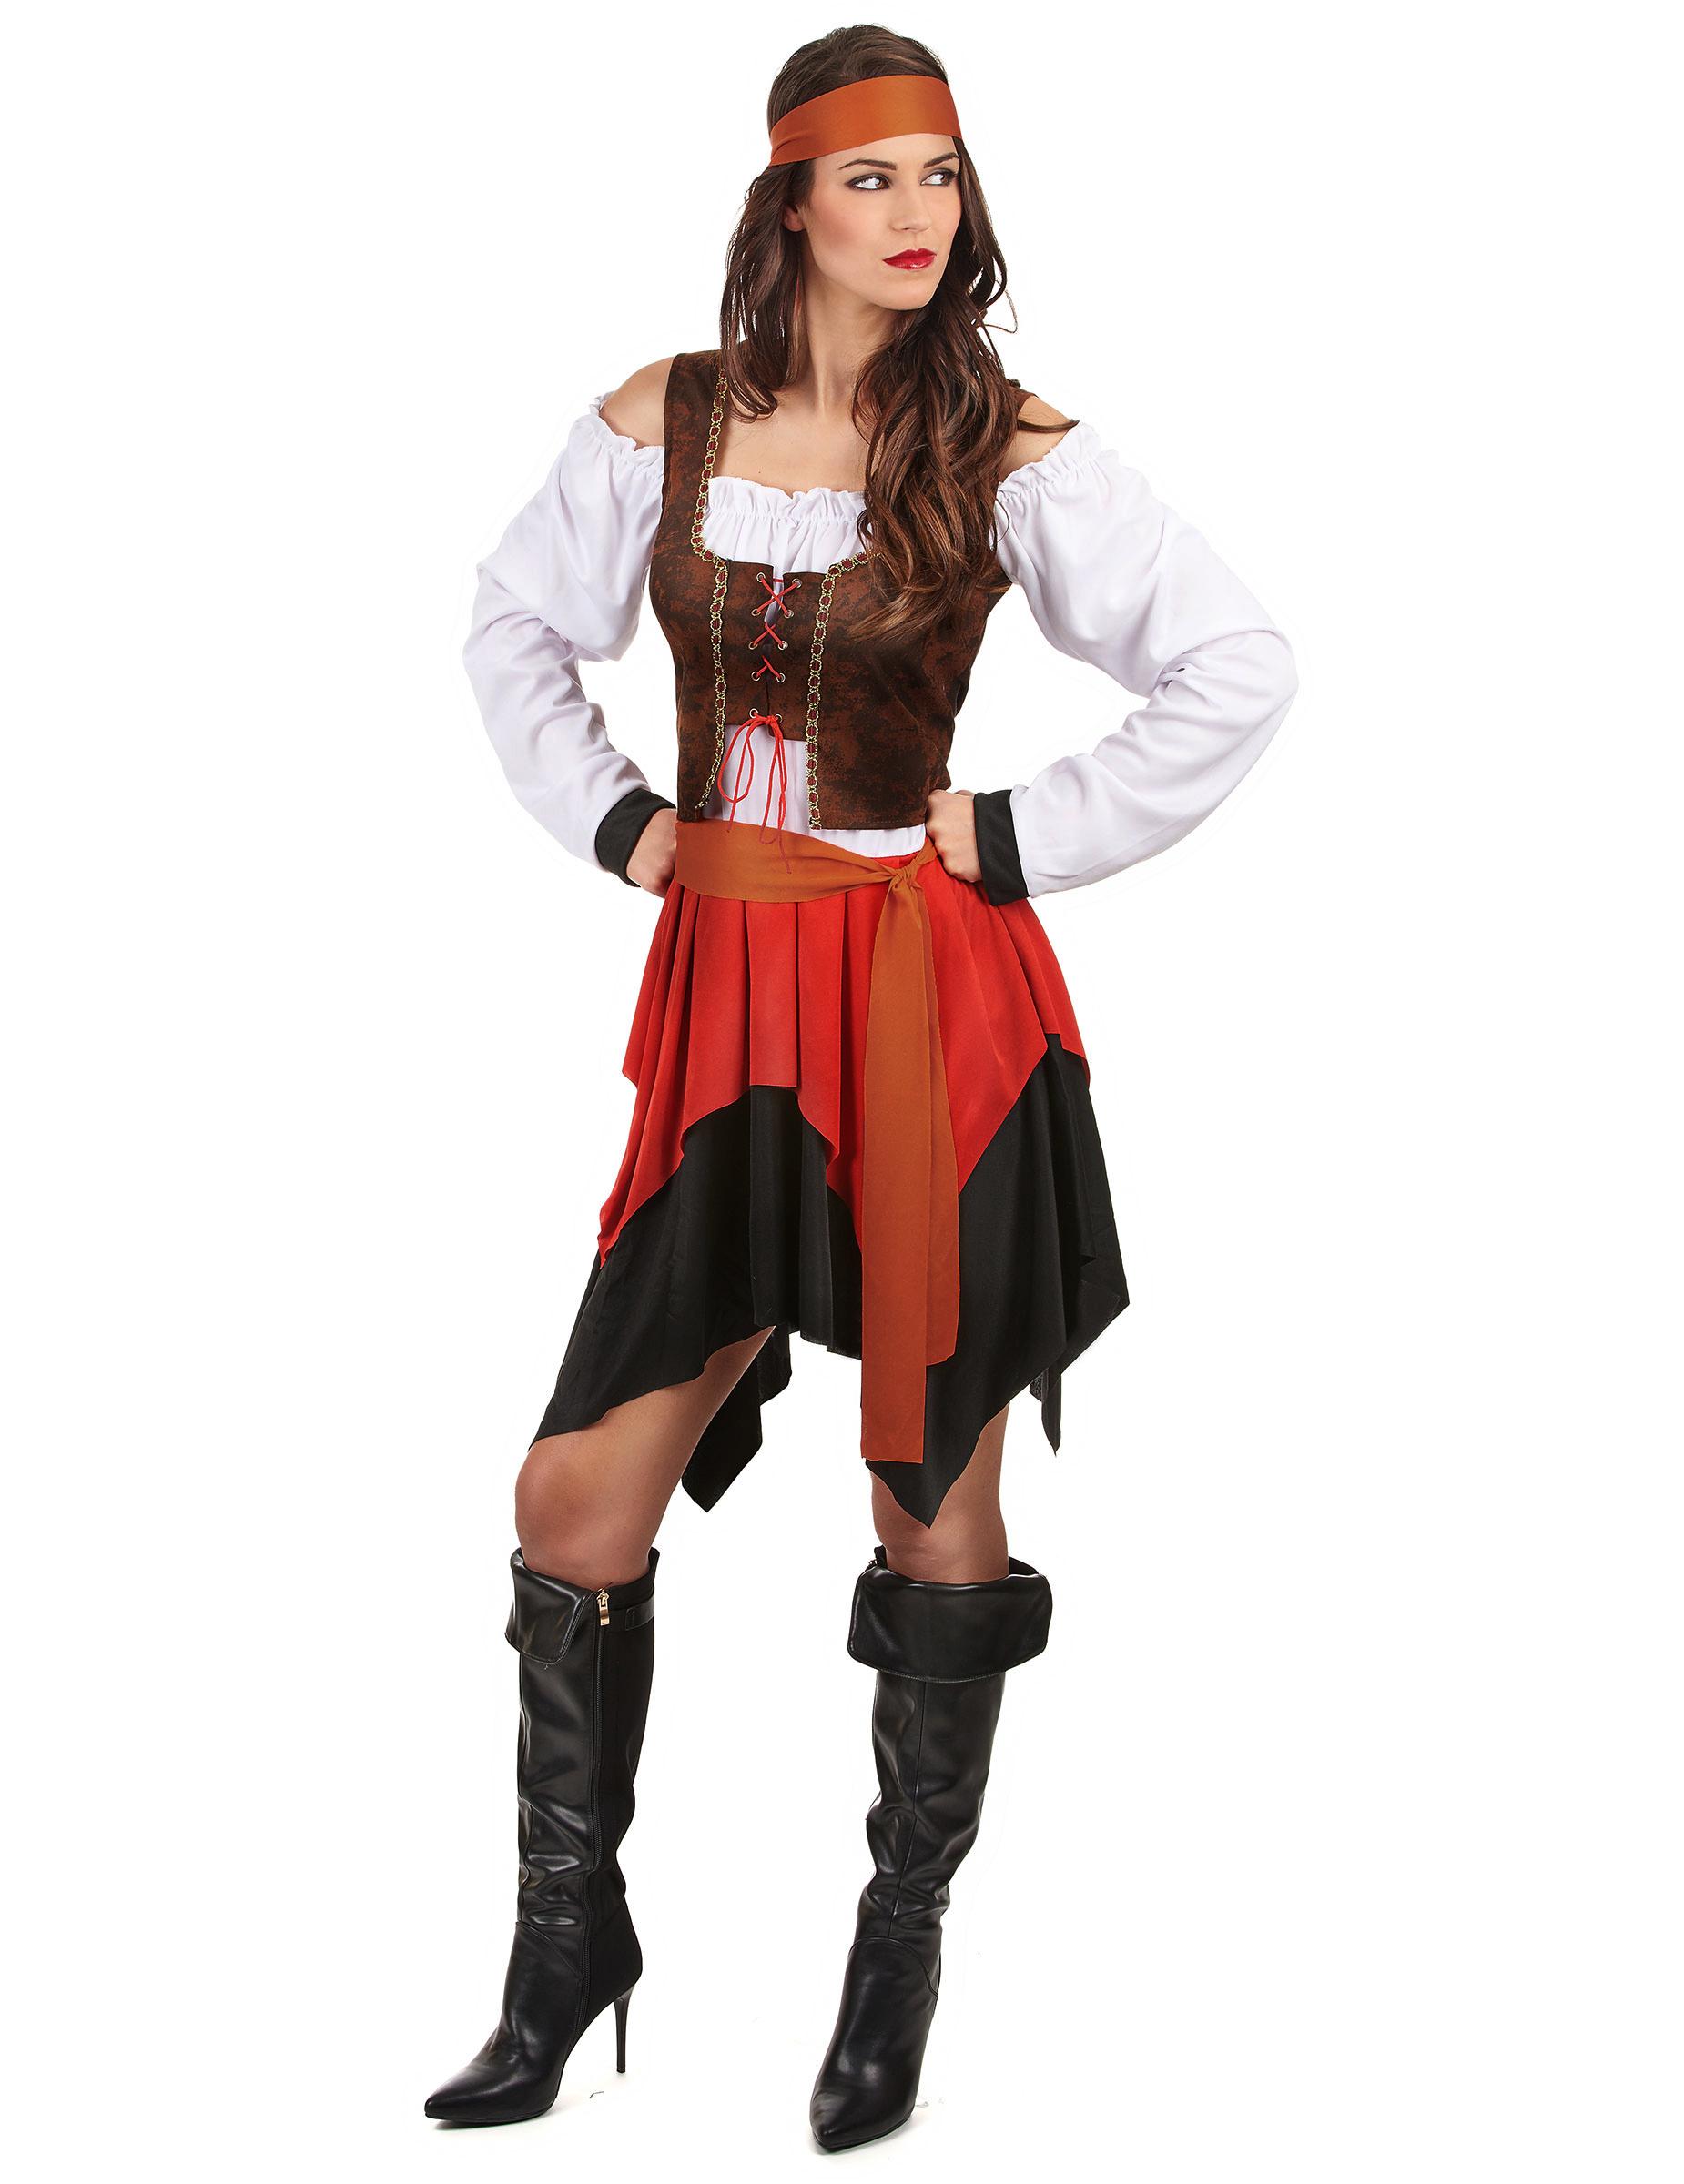 654b9ab7432 Originele piraten carnavalskleding voor dames - Vegaoo.nl